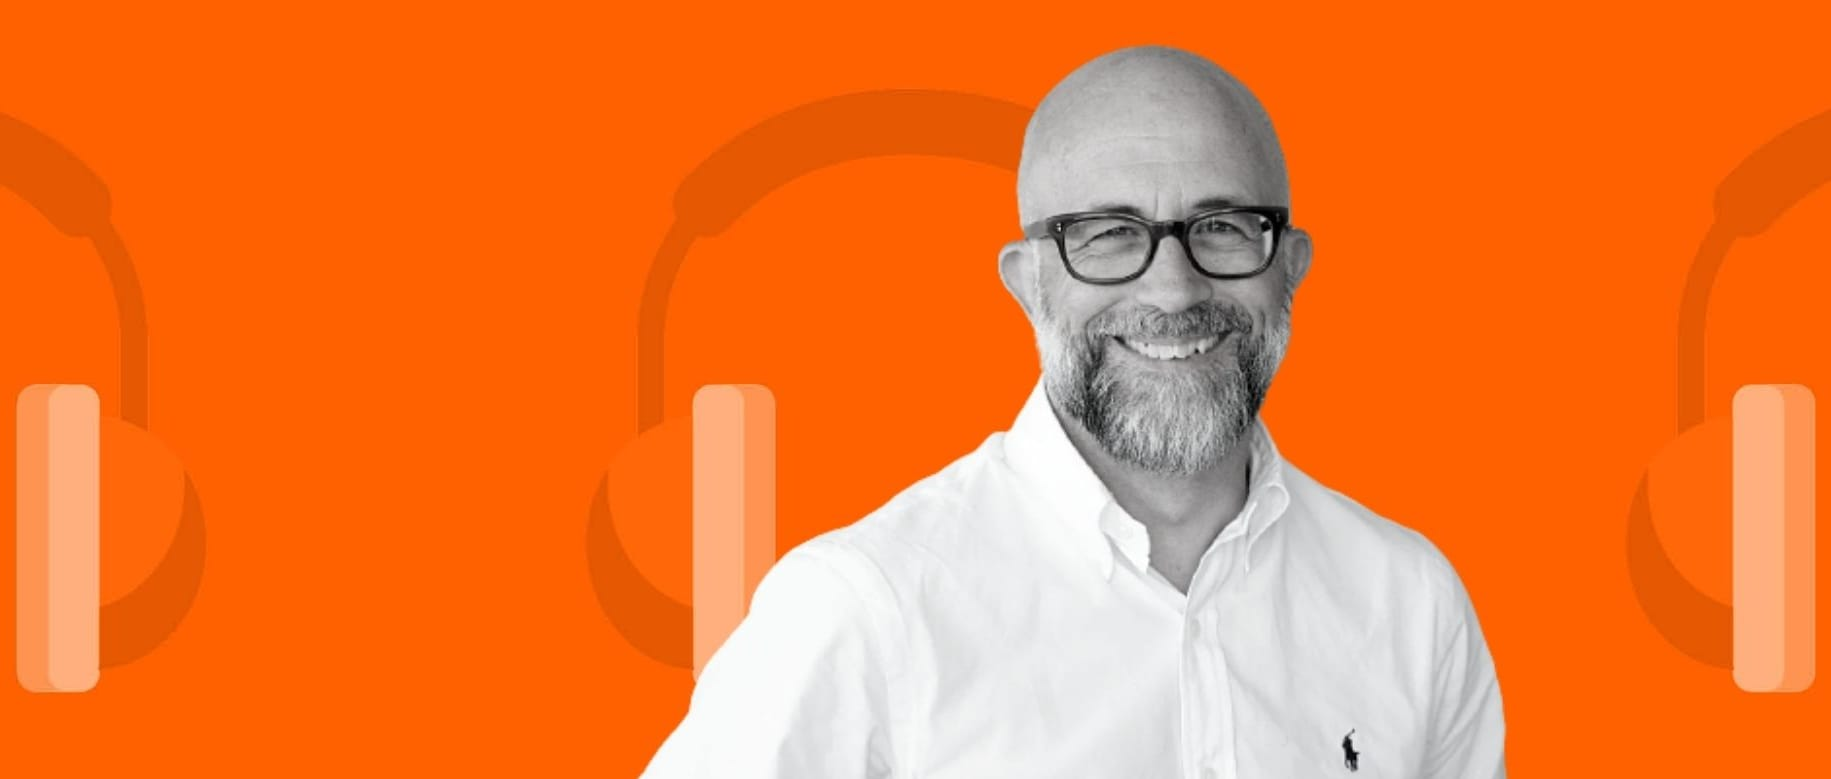 Urs Bucher, Podcast